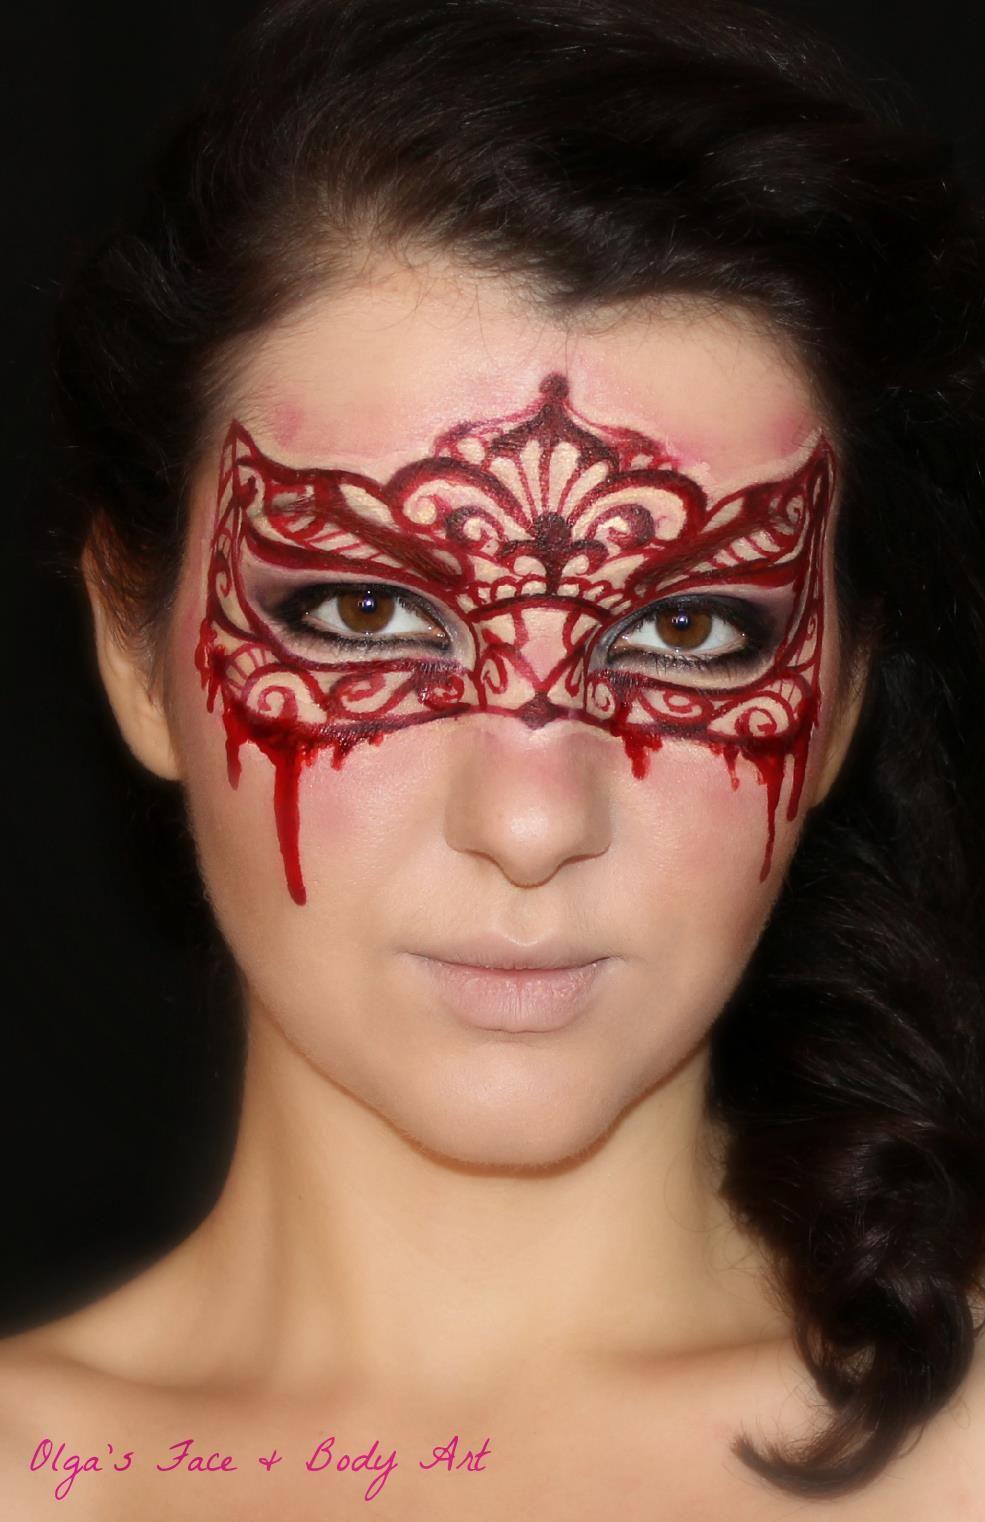 olga meleca halloween design face painting bloody maskerade mask face painting pinterest. Black Bedroom Furniture Sets. Home Design Ideas